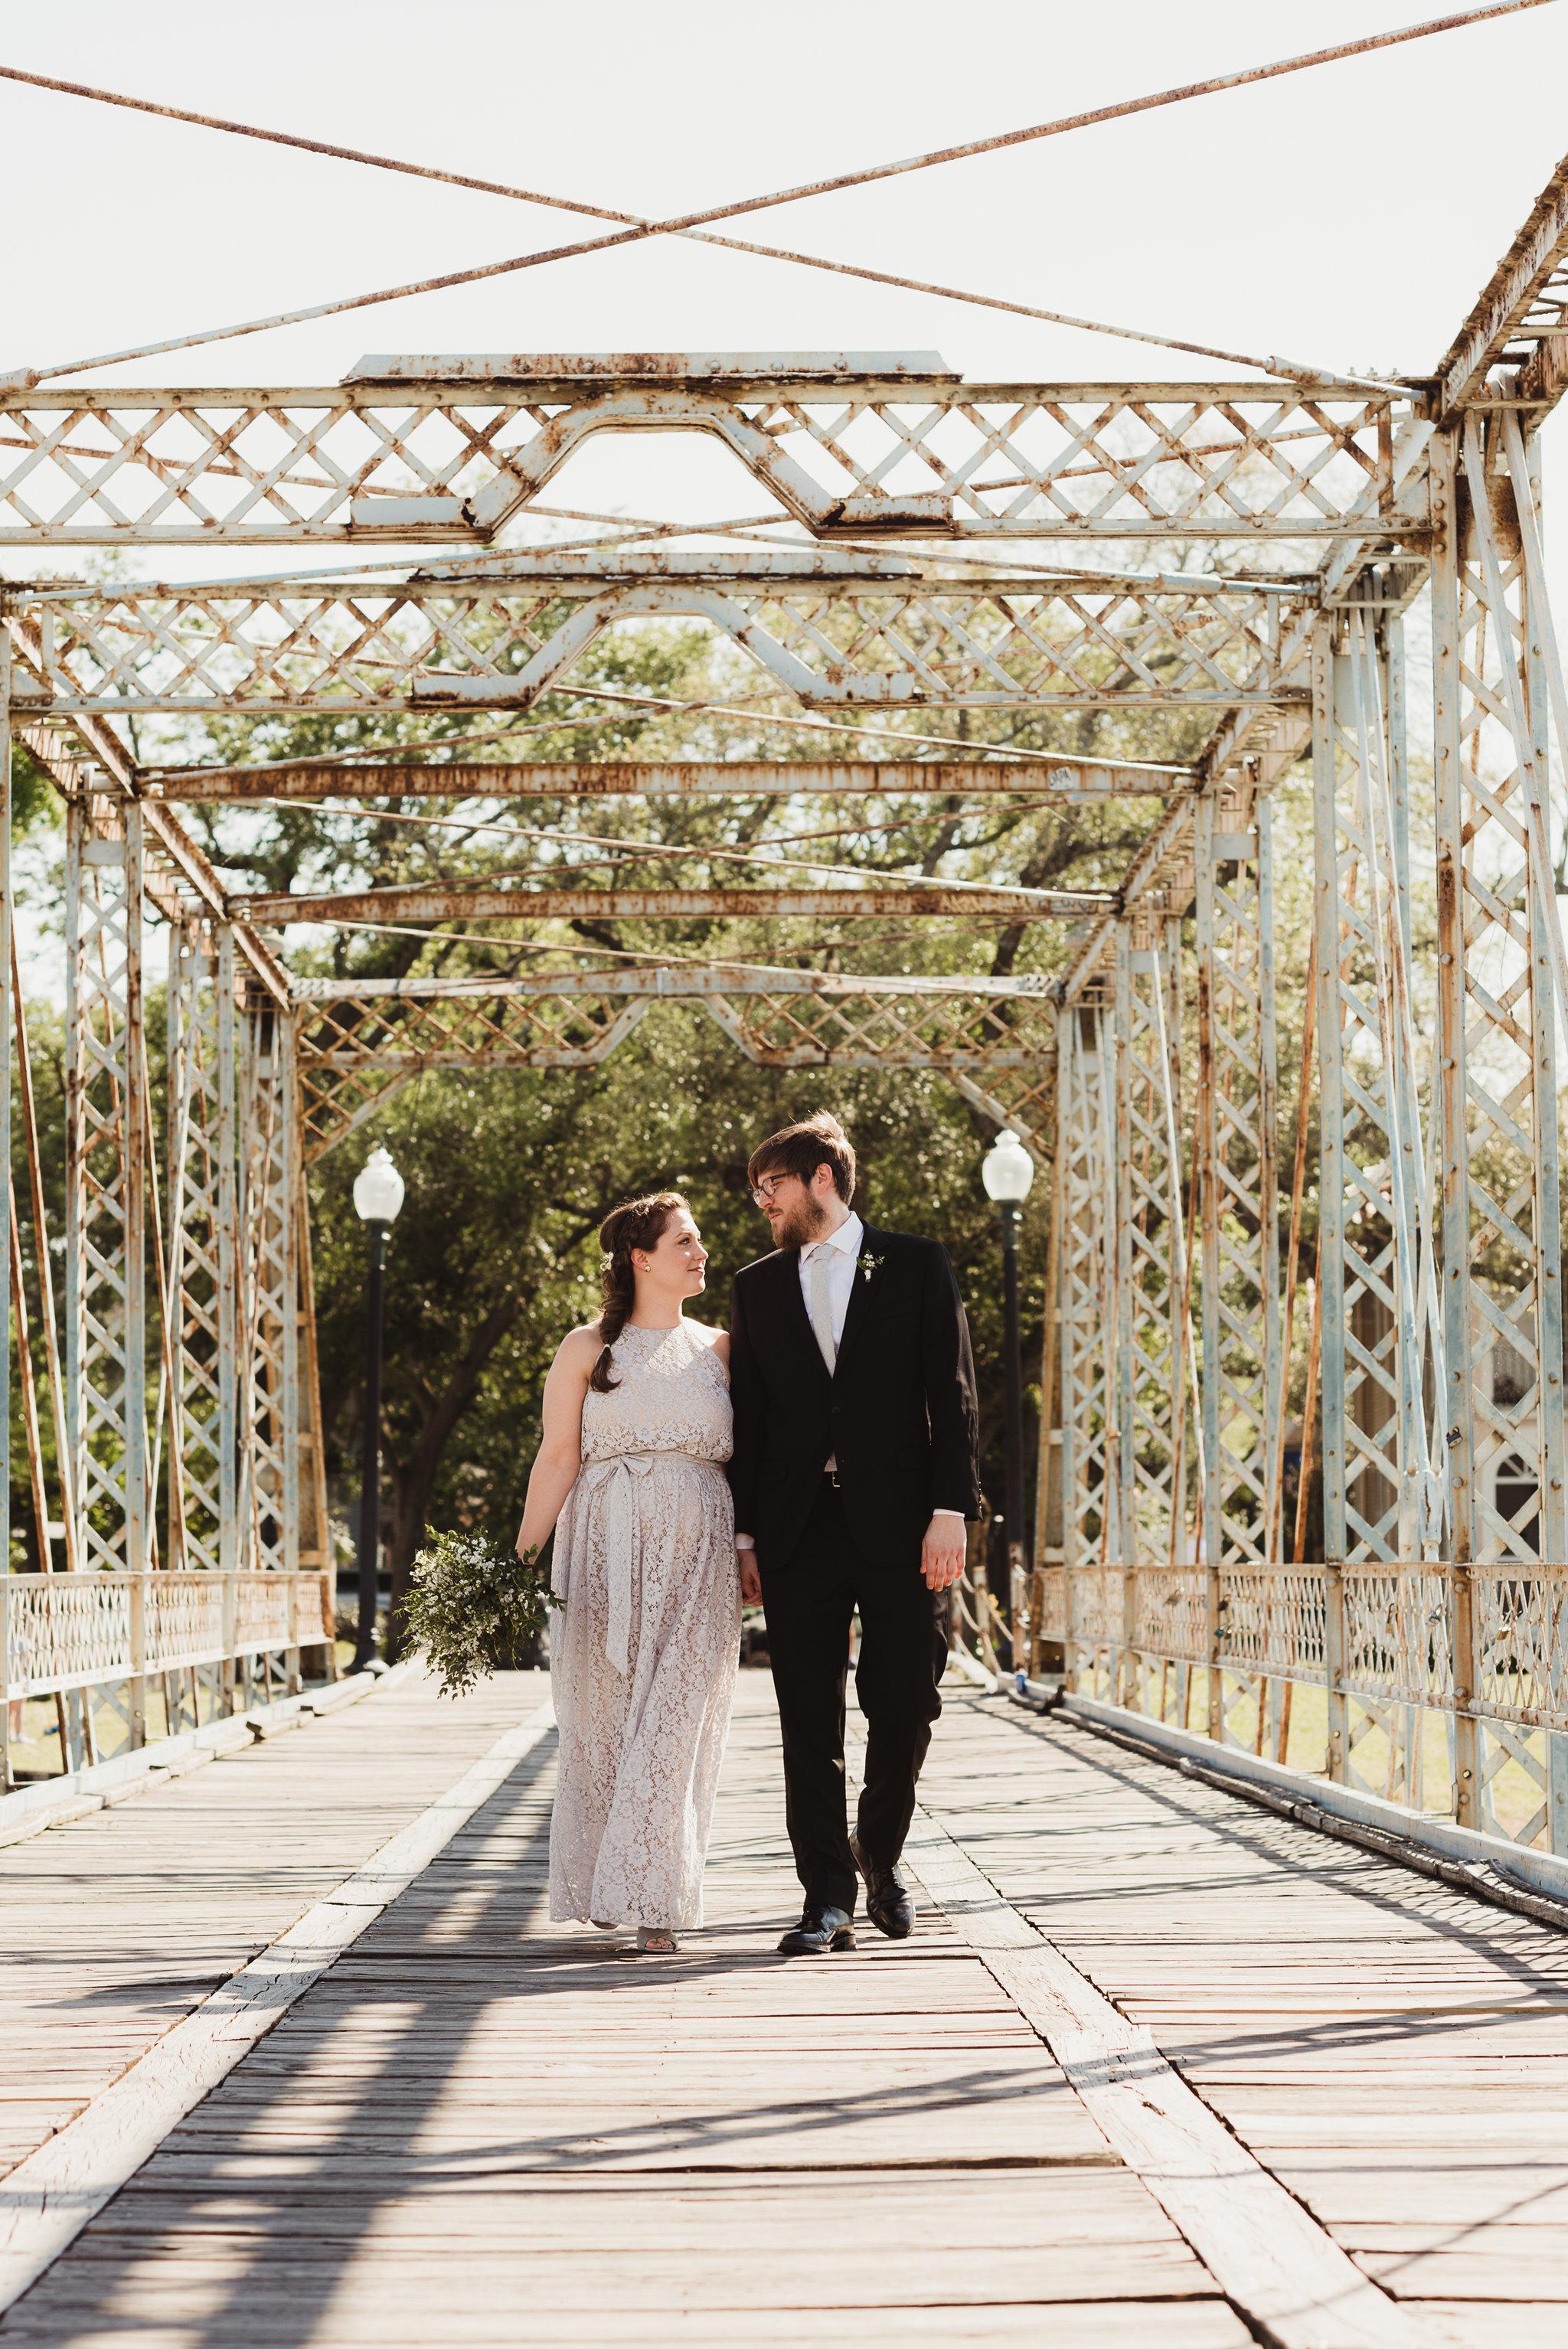 Andrea&EvanWedding166.jpg